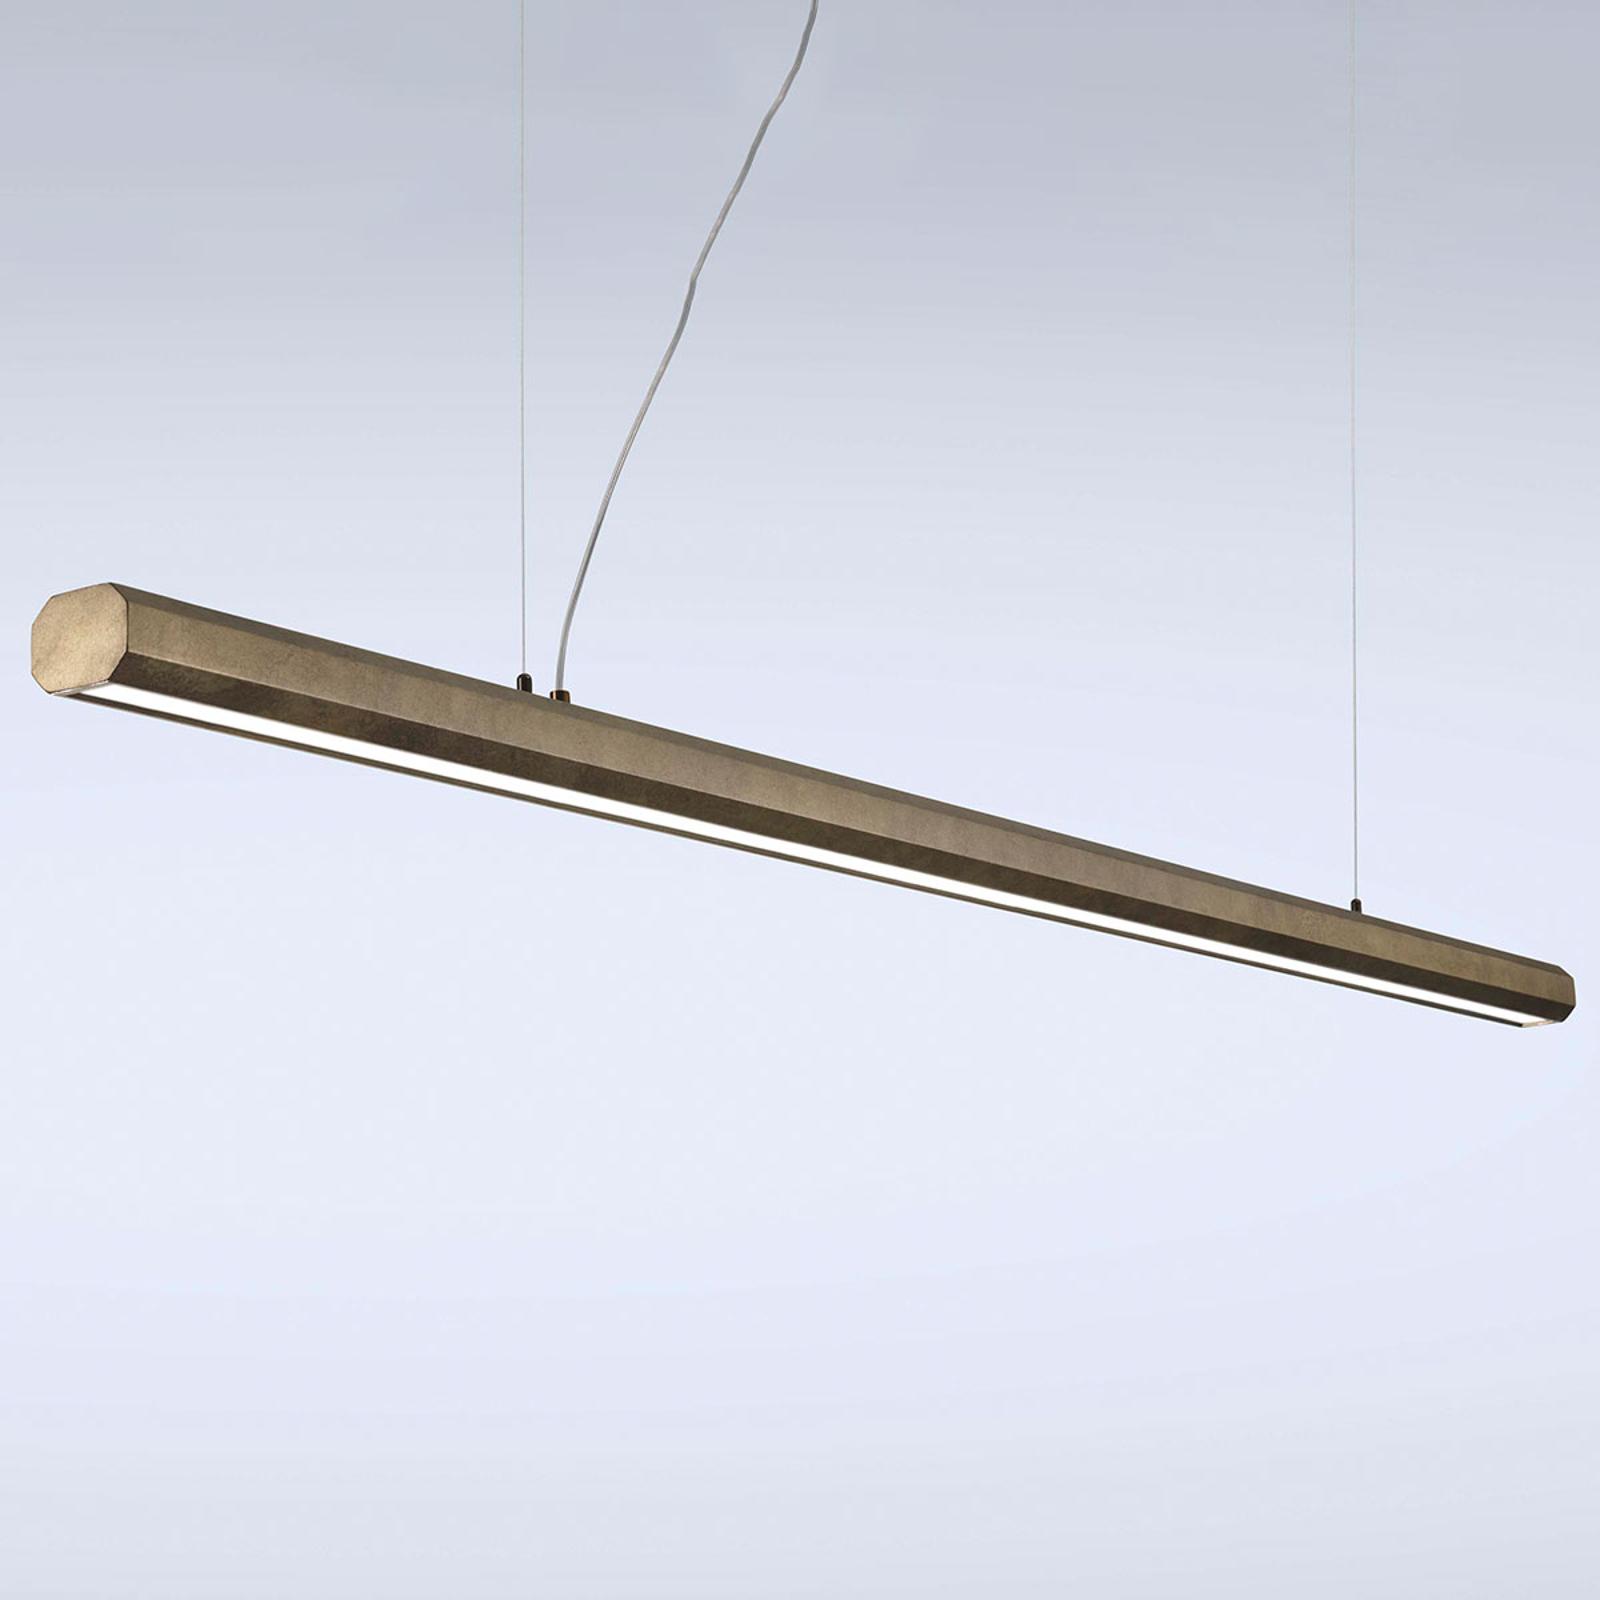 Lampa wisząca LED Materica belka 200 cm mosiądz